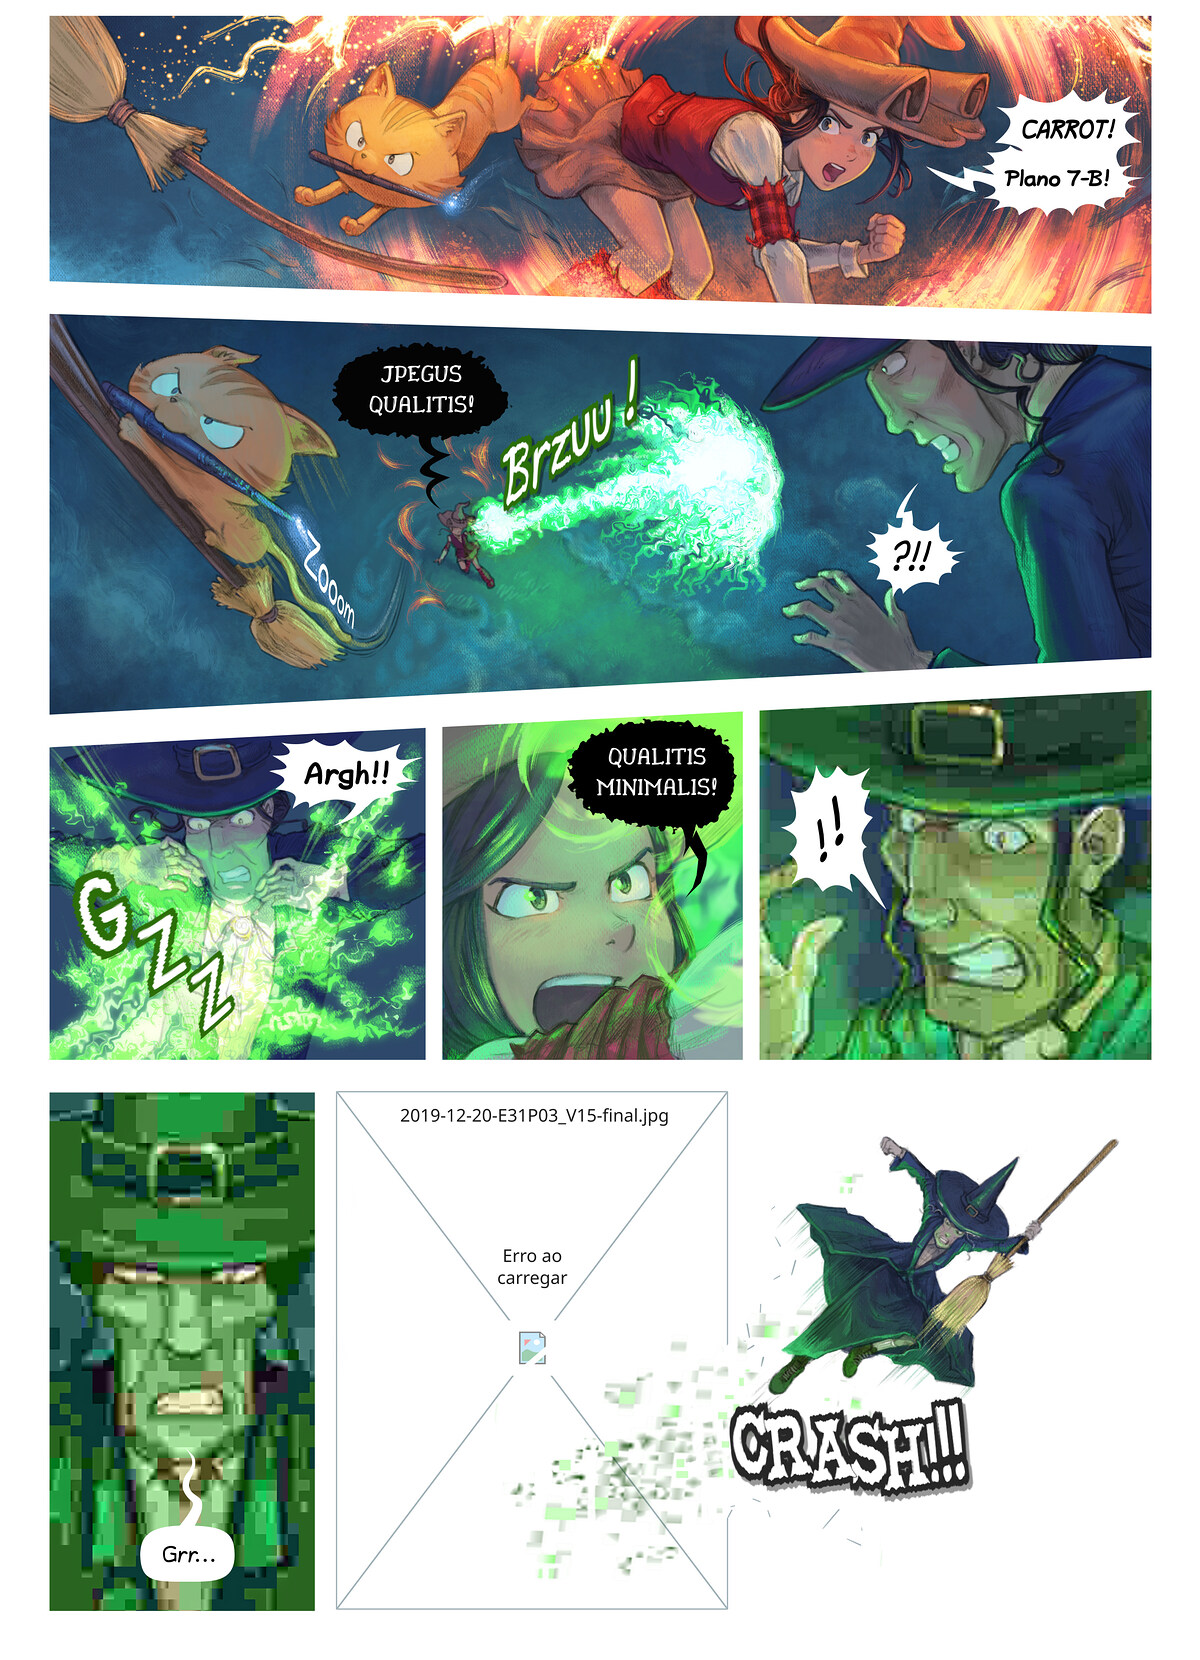 A webcomic page of Pepper&Carrot, episódio 31 [pt], página 3